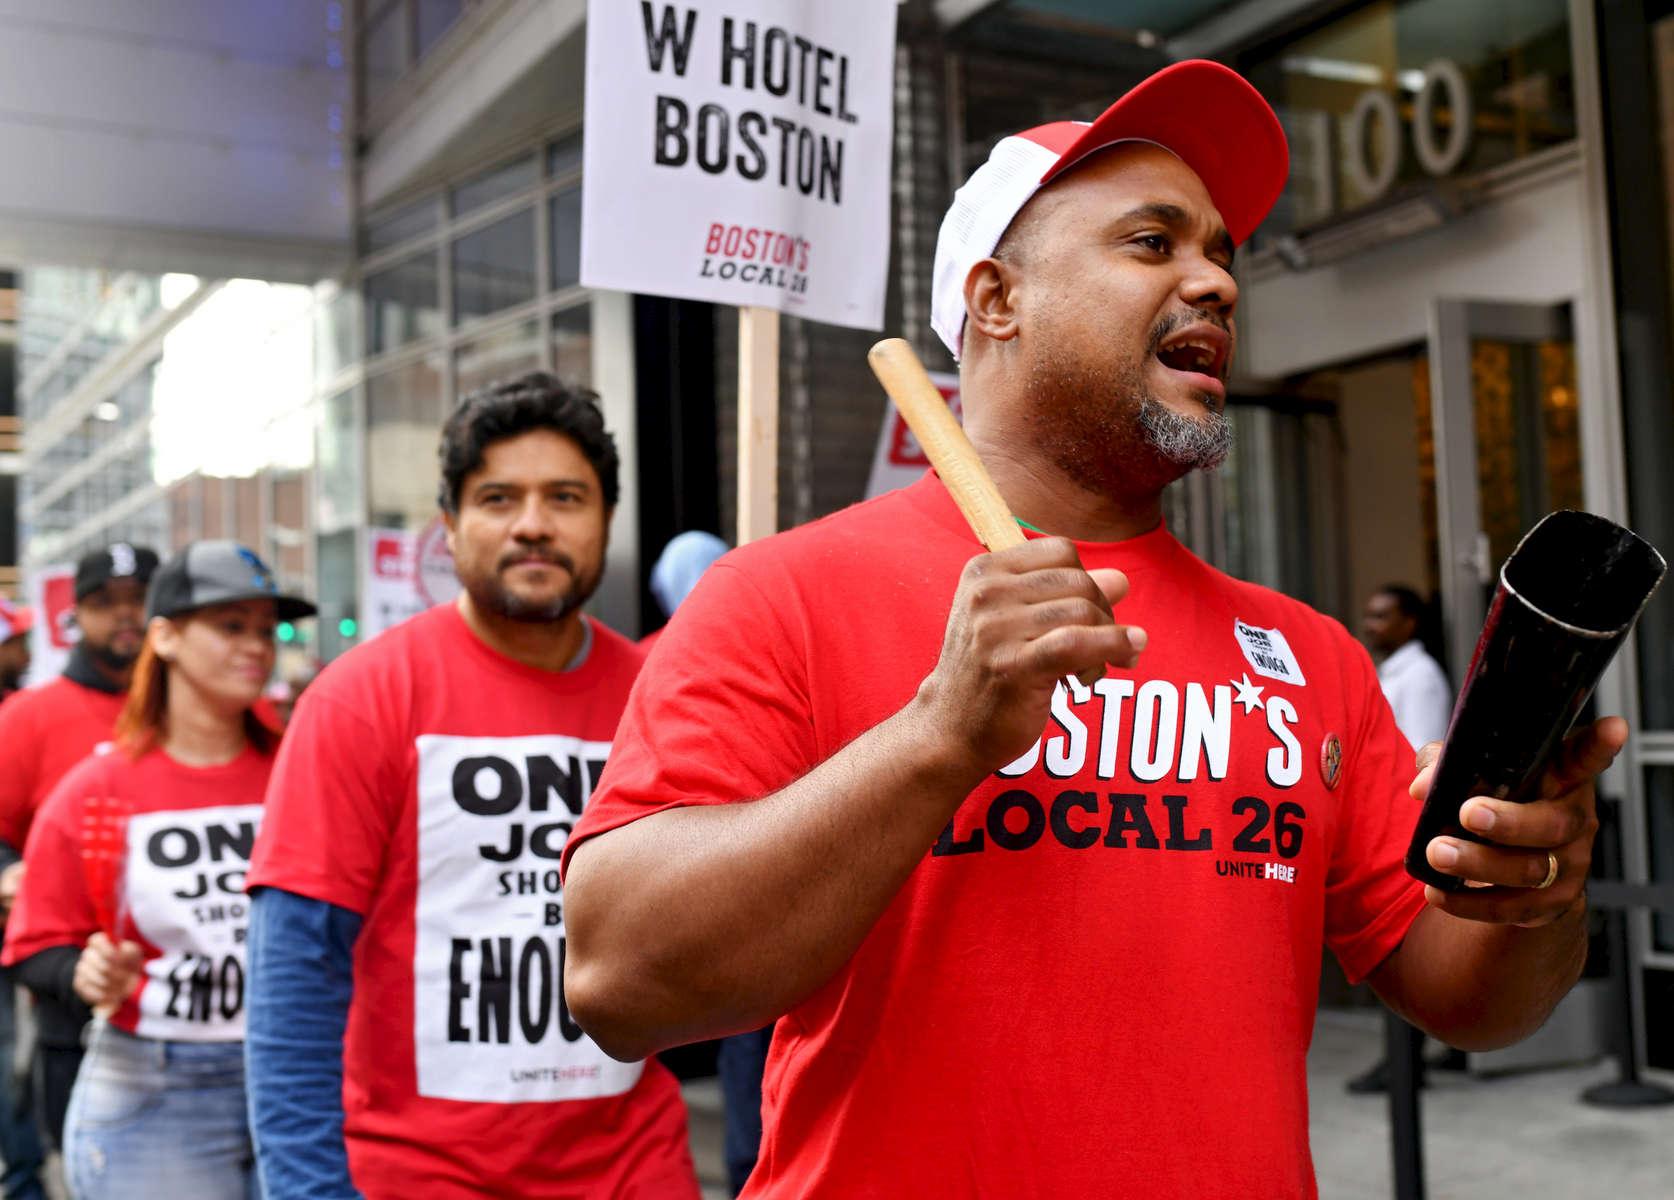 Boston-Union-Organization-Event-Photographer-54